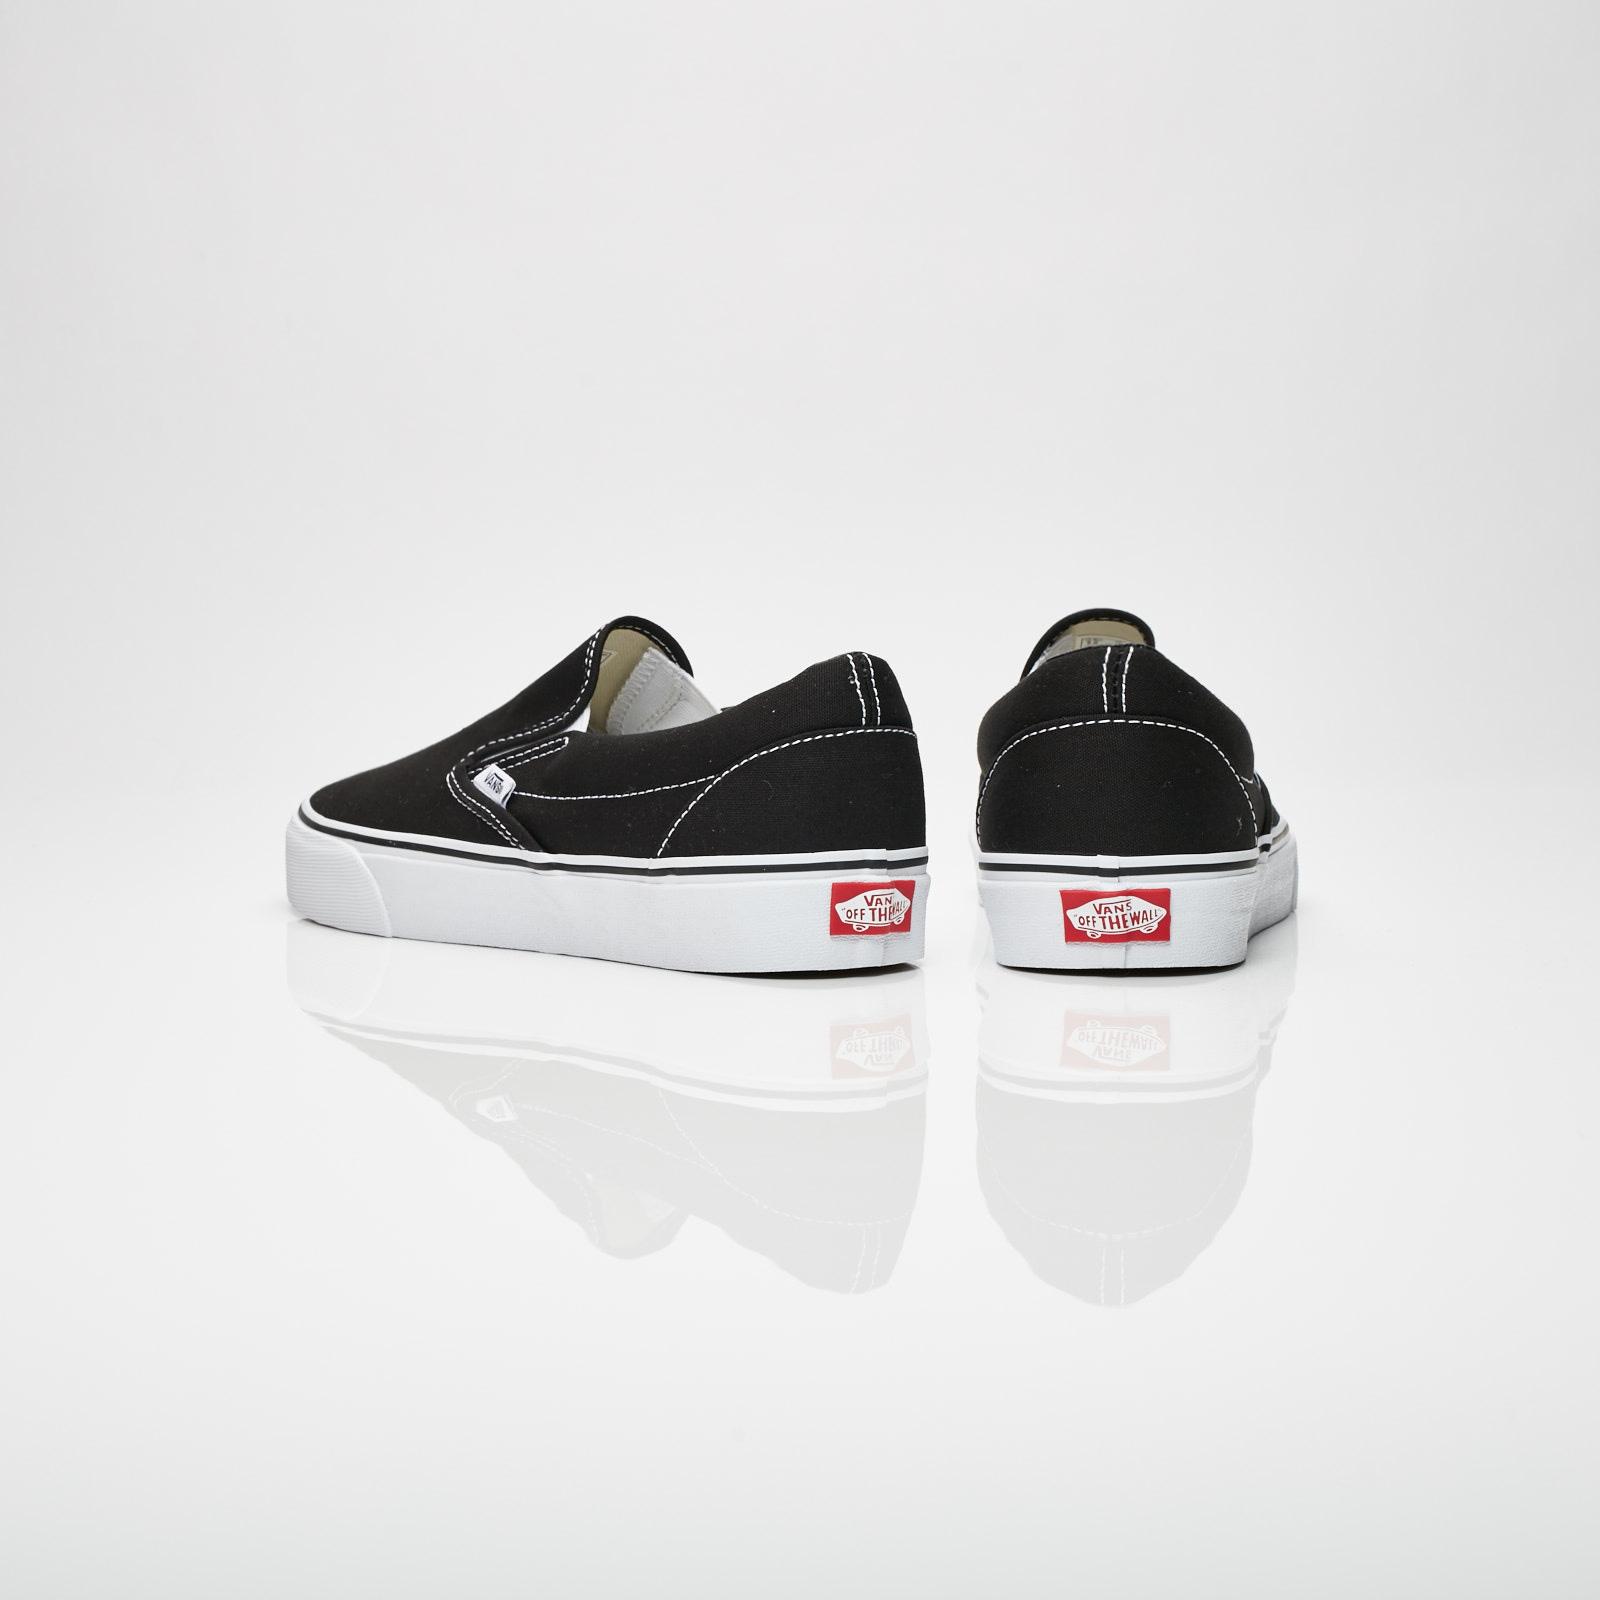 db5402623e3401 Vans Classic Slip-On - Veyeblk - Sneakersnstuff